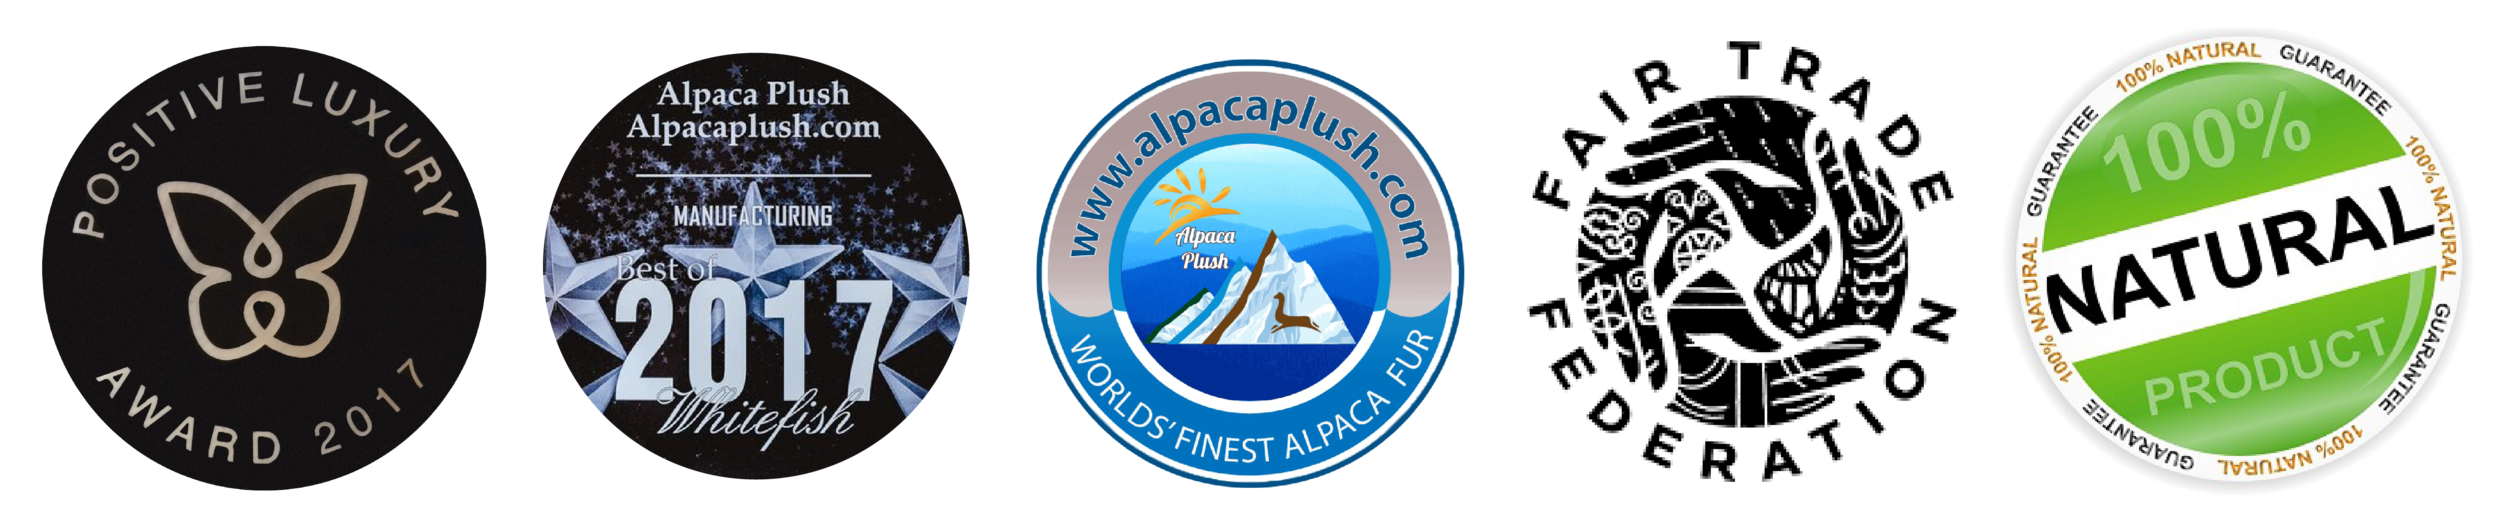 Alpaca Plush Awards and Badges